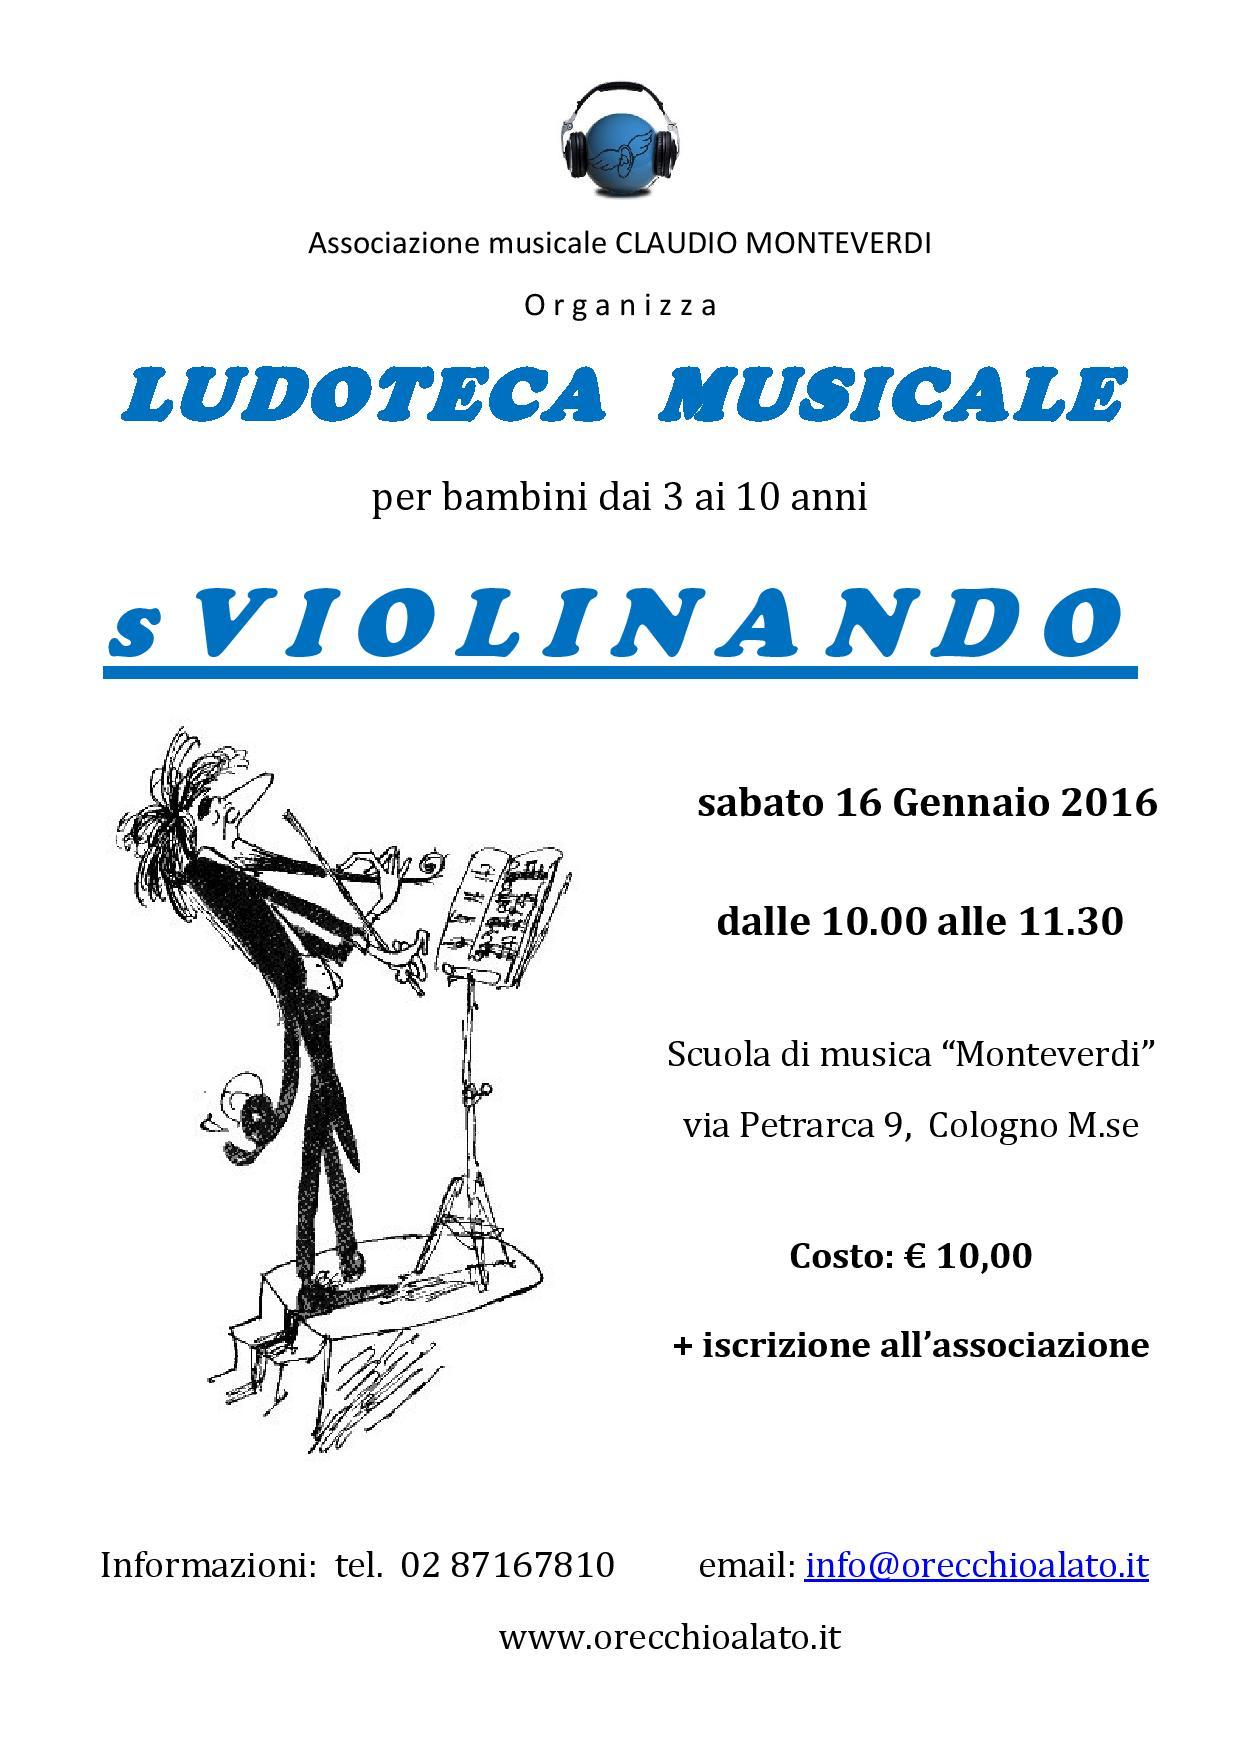 LOCANDINA sviolinando - 16 gen 2016-page-001